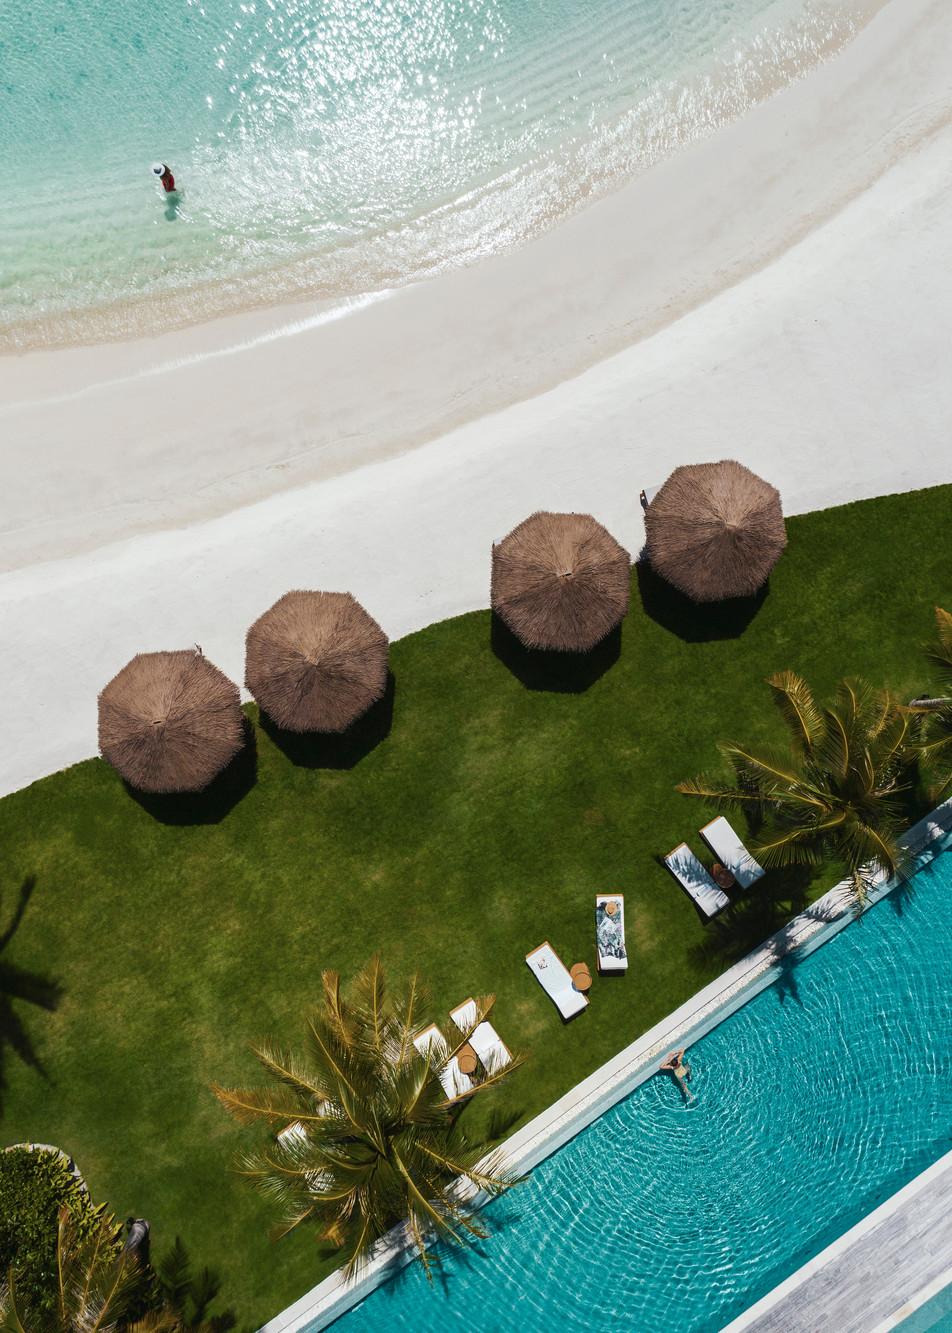 The Waldorf Astoria, Maldives